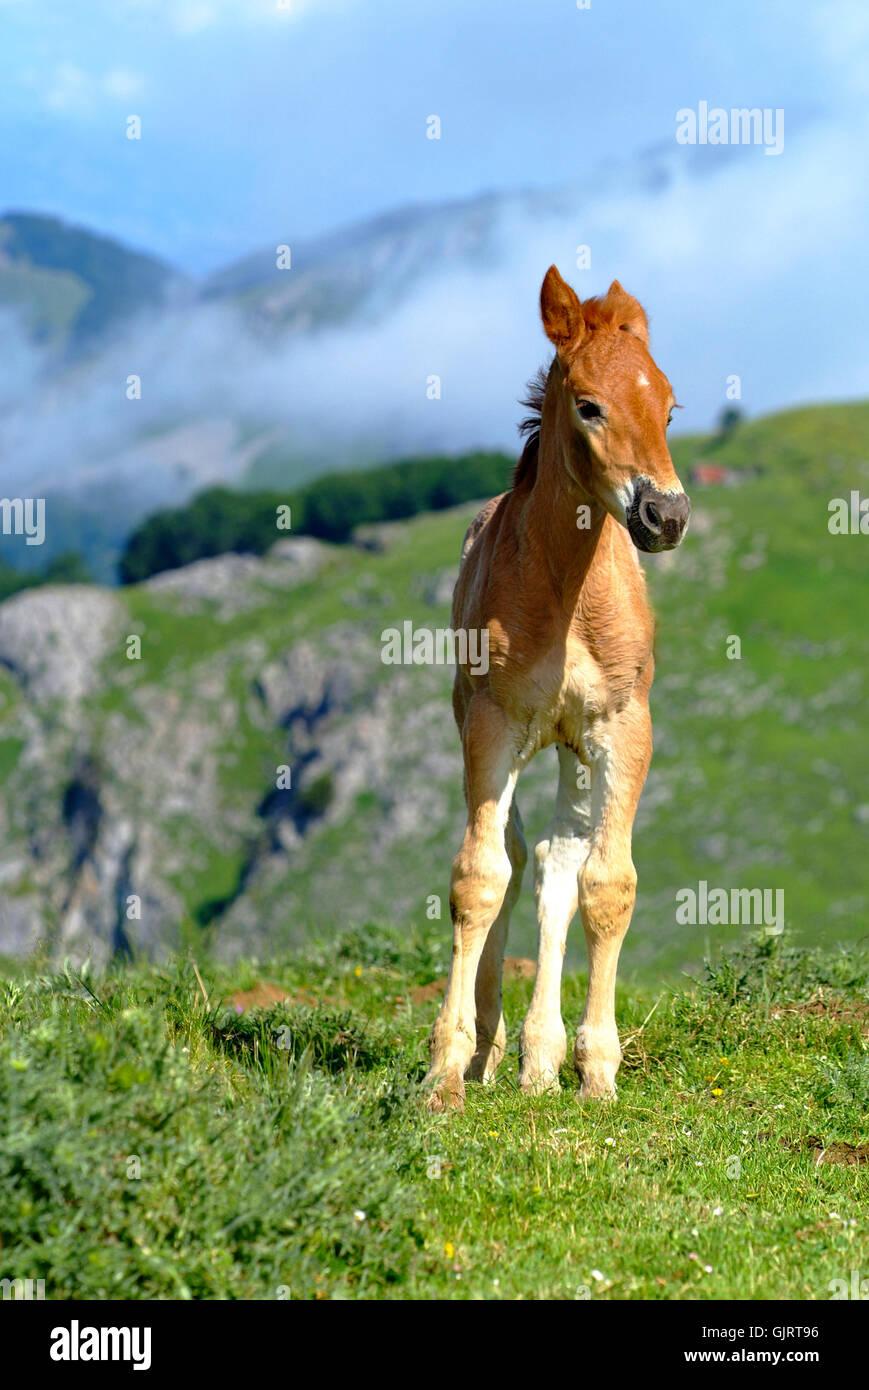 horse tenderness colt - Stock Image